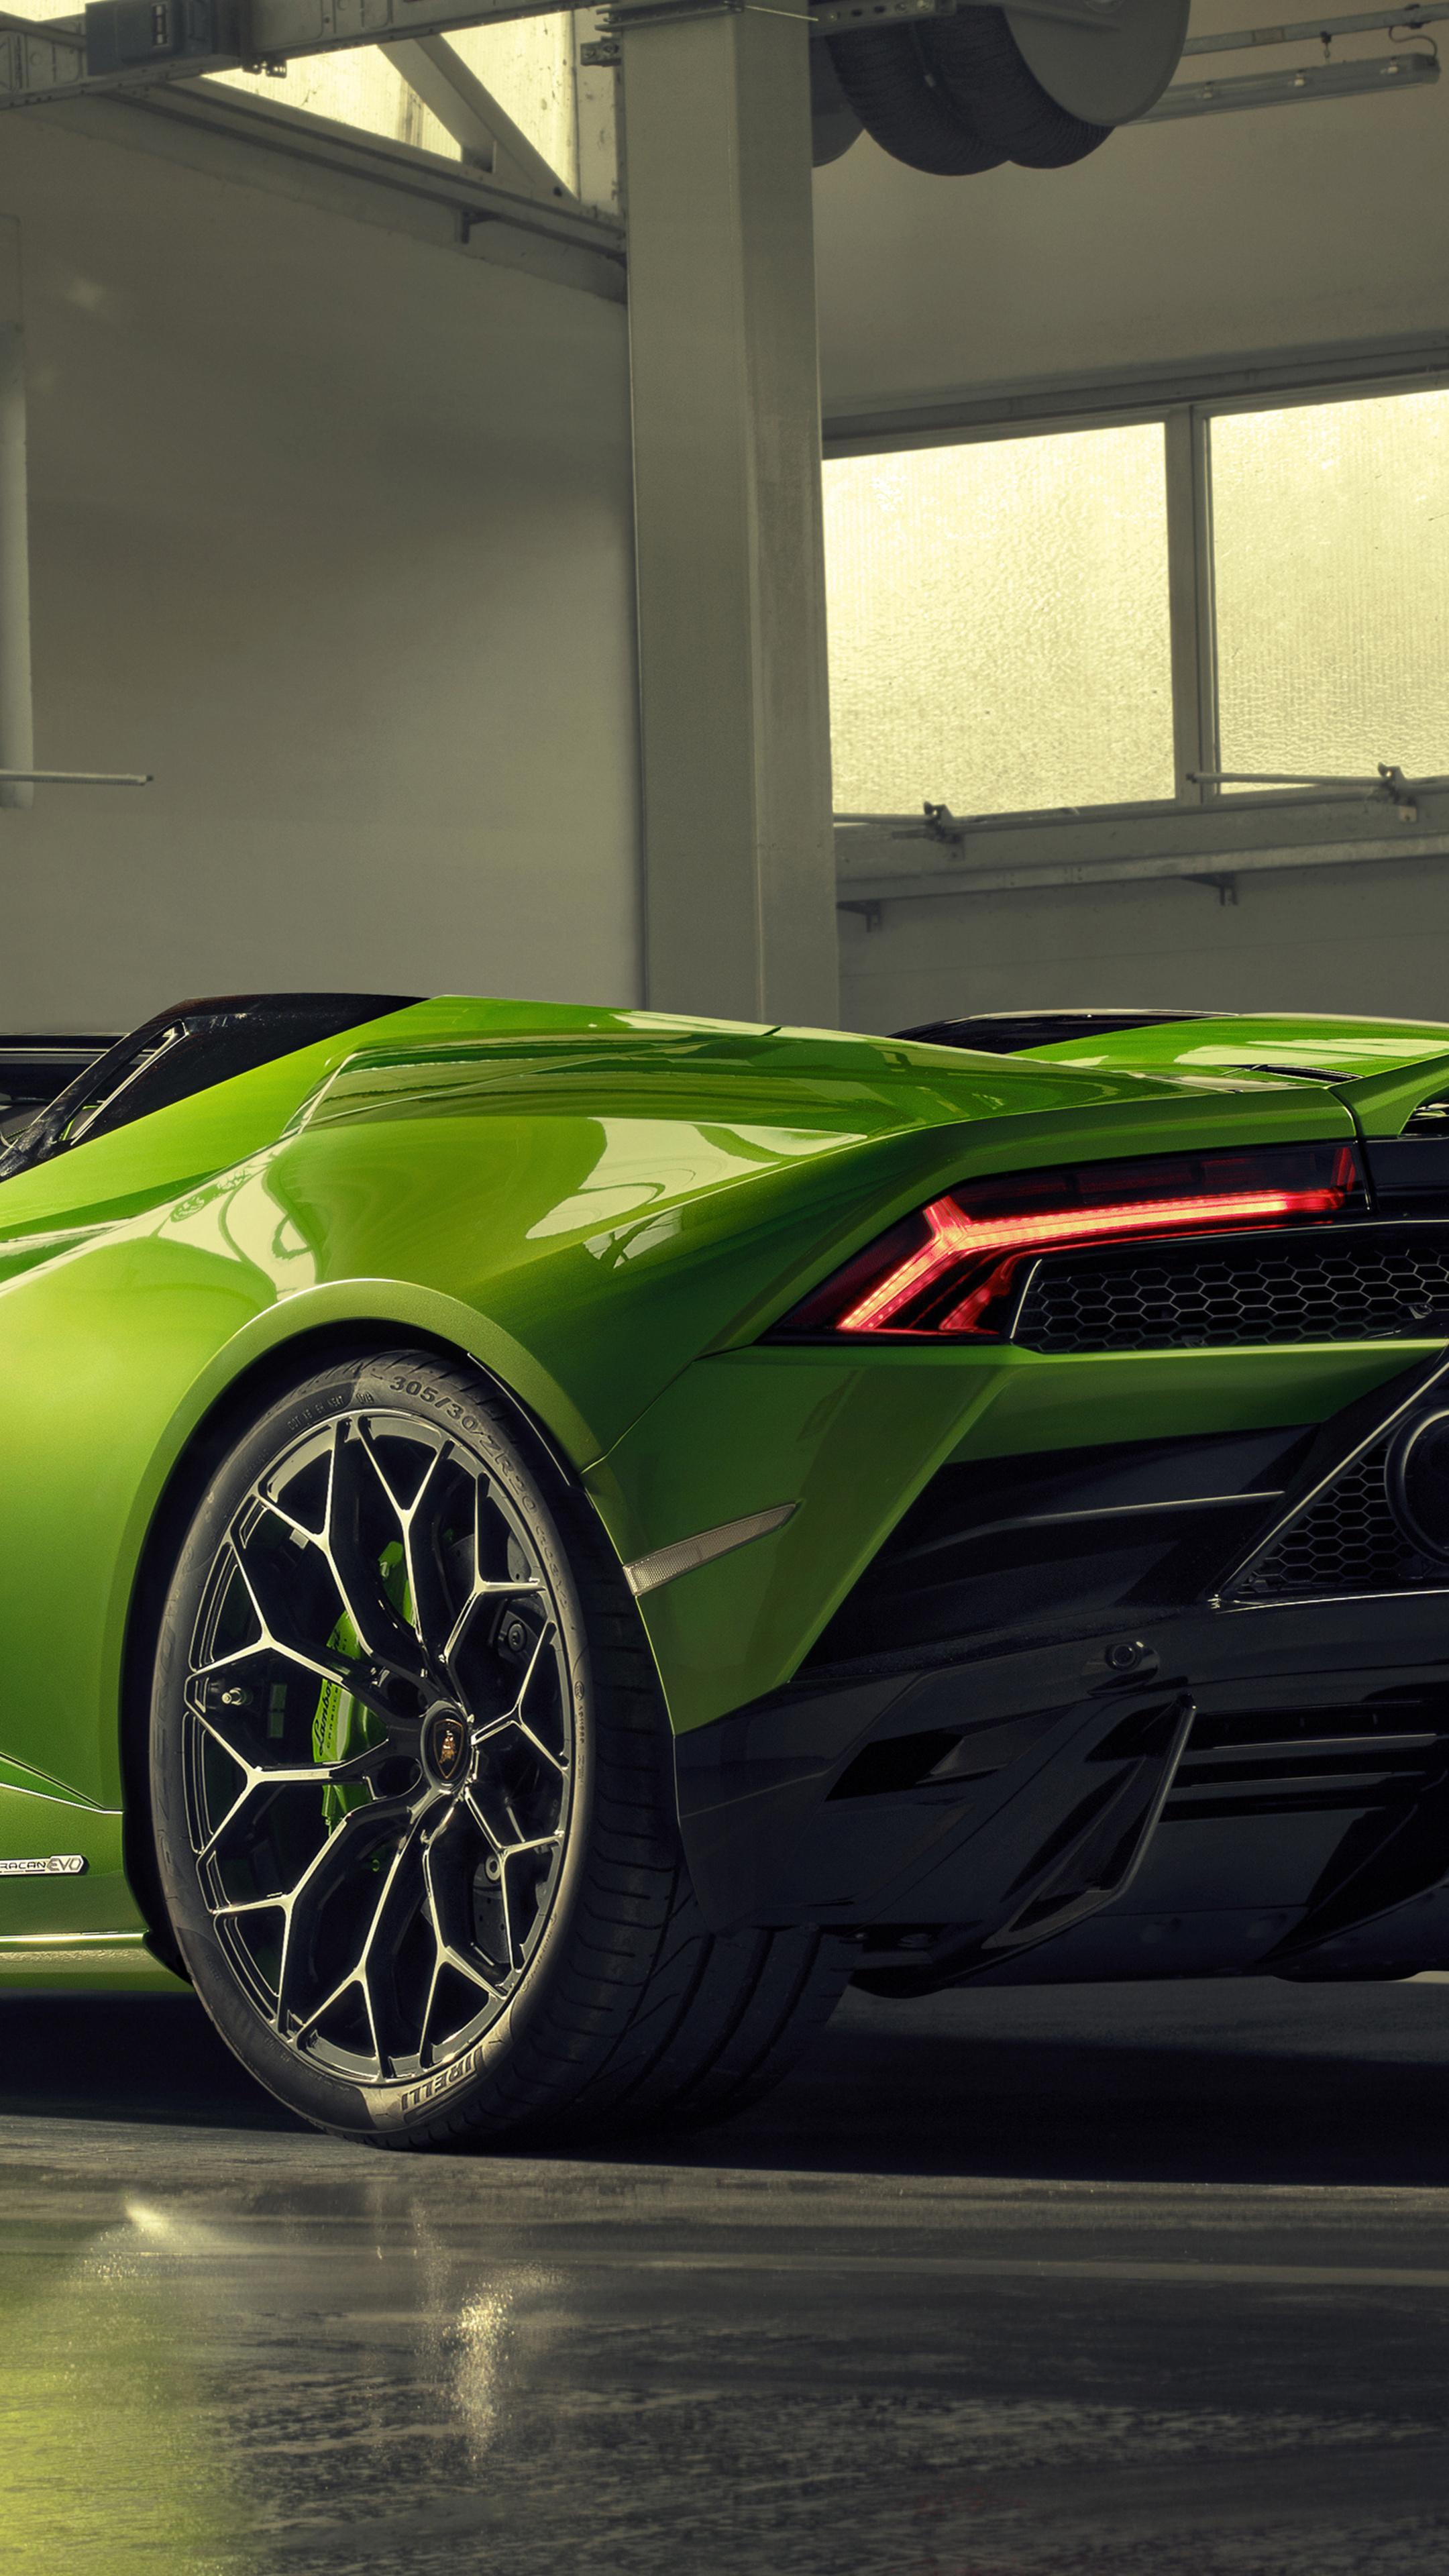 2160x3840 2019 Lamborghini Huracan Evo Spyder Rear View Sony Xperia